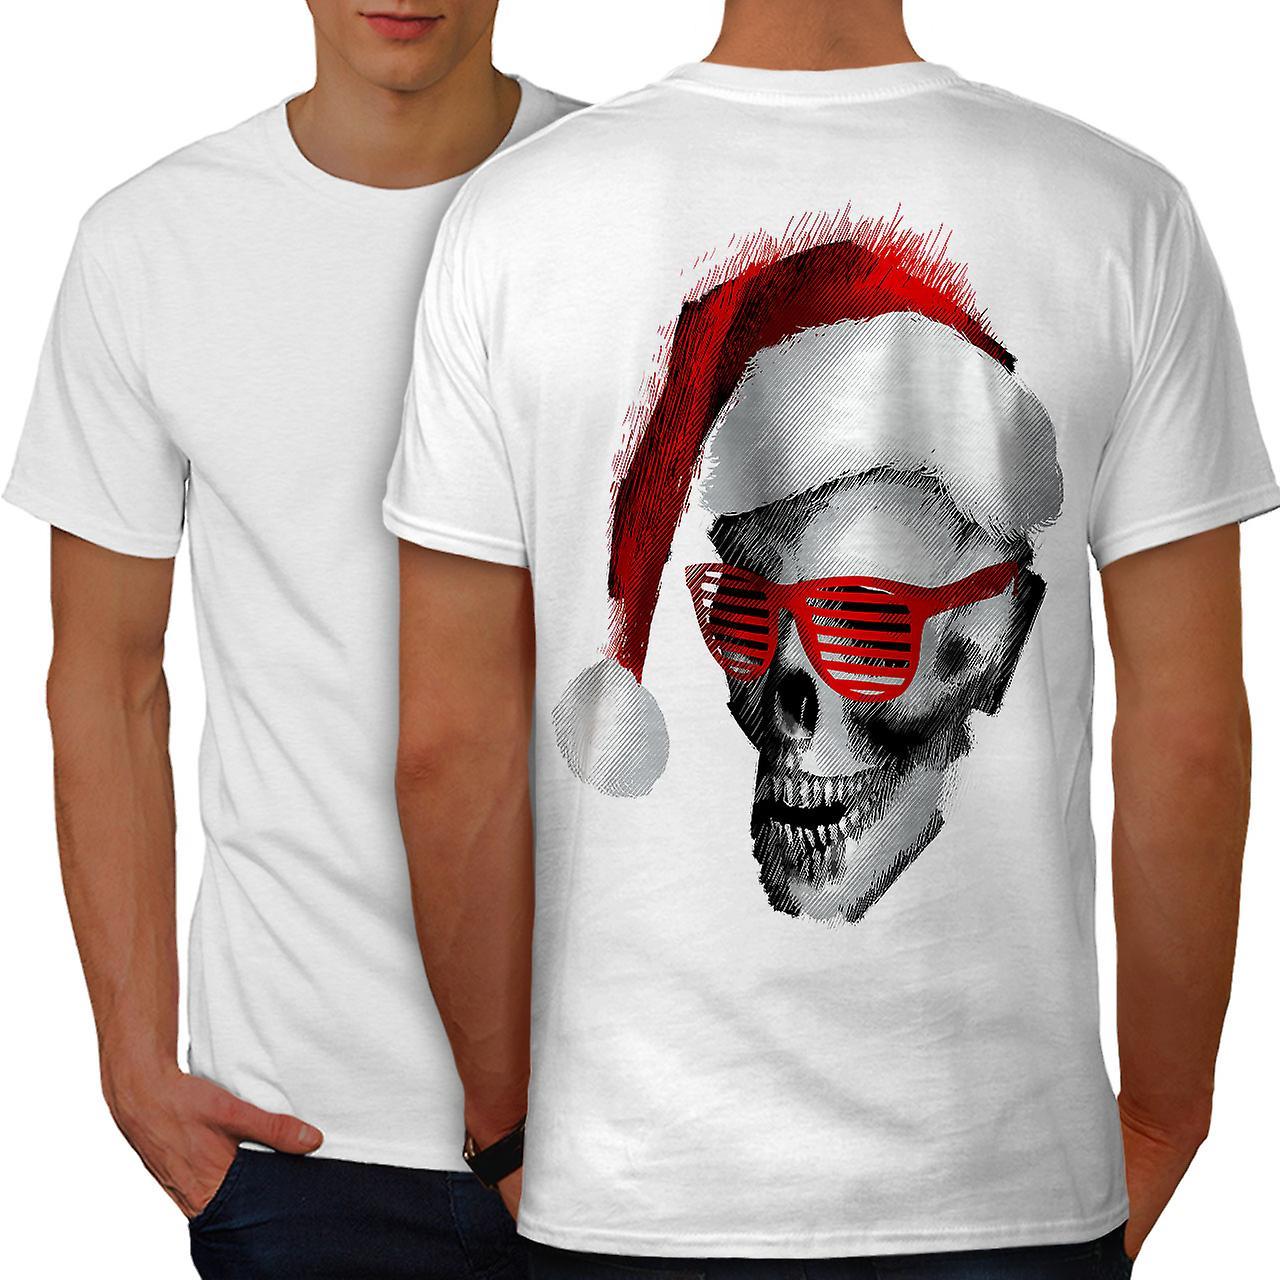 Swag santa claus fashion men whitet shirt back wellcoda